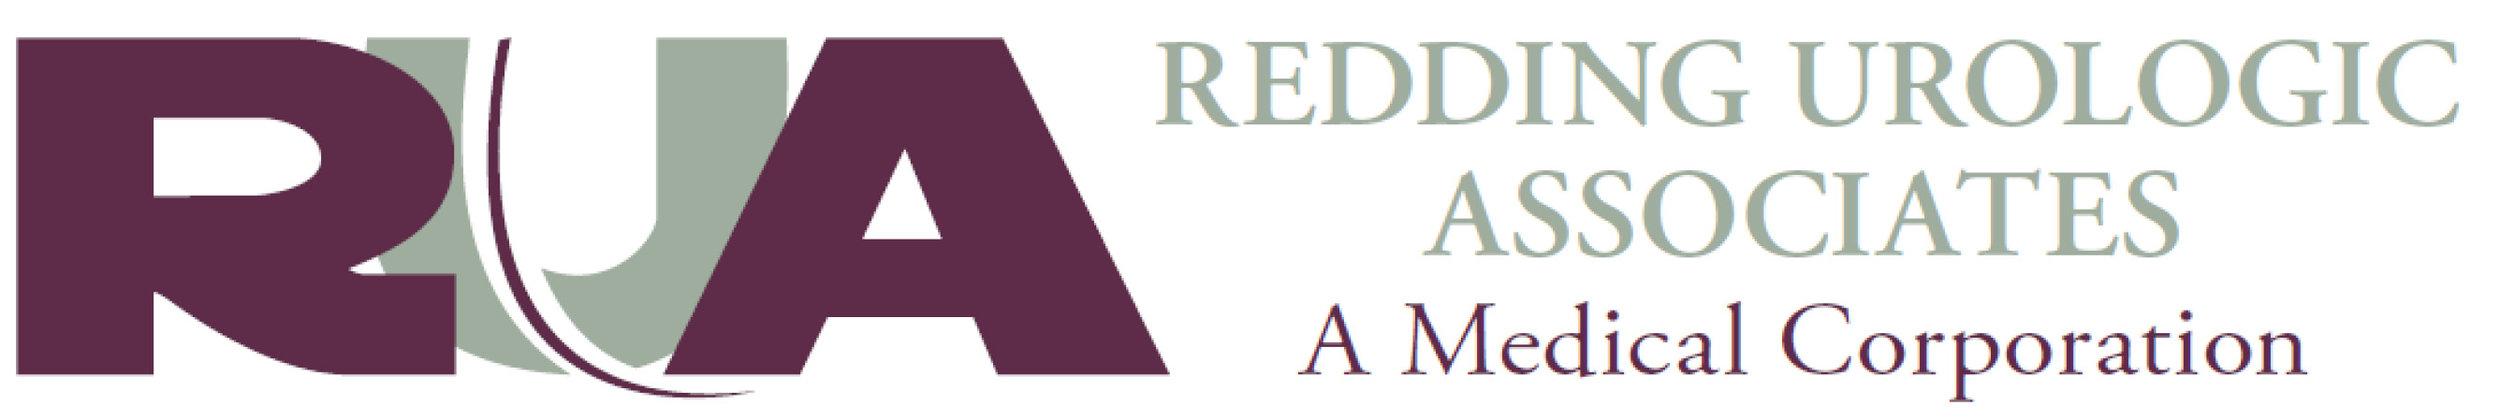 RUA logo.jpg